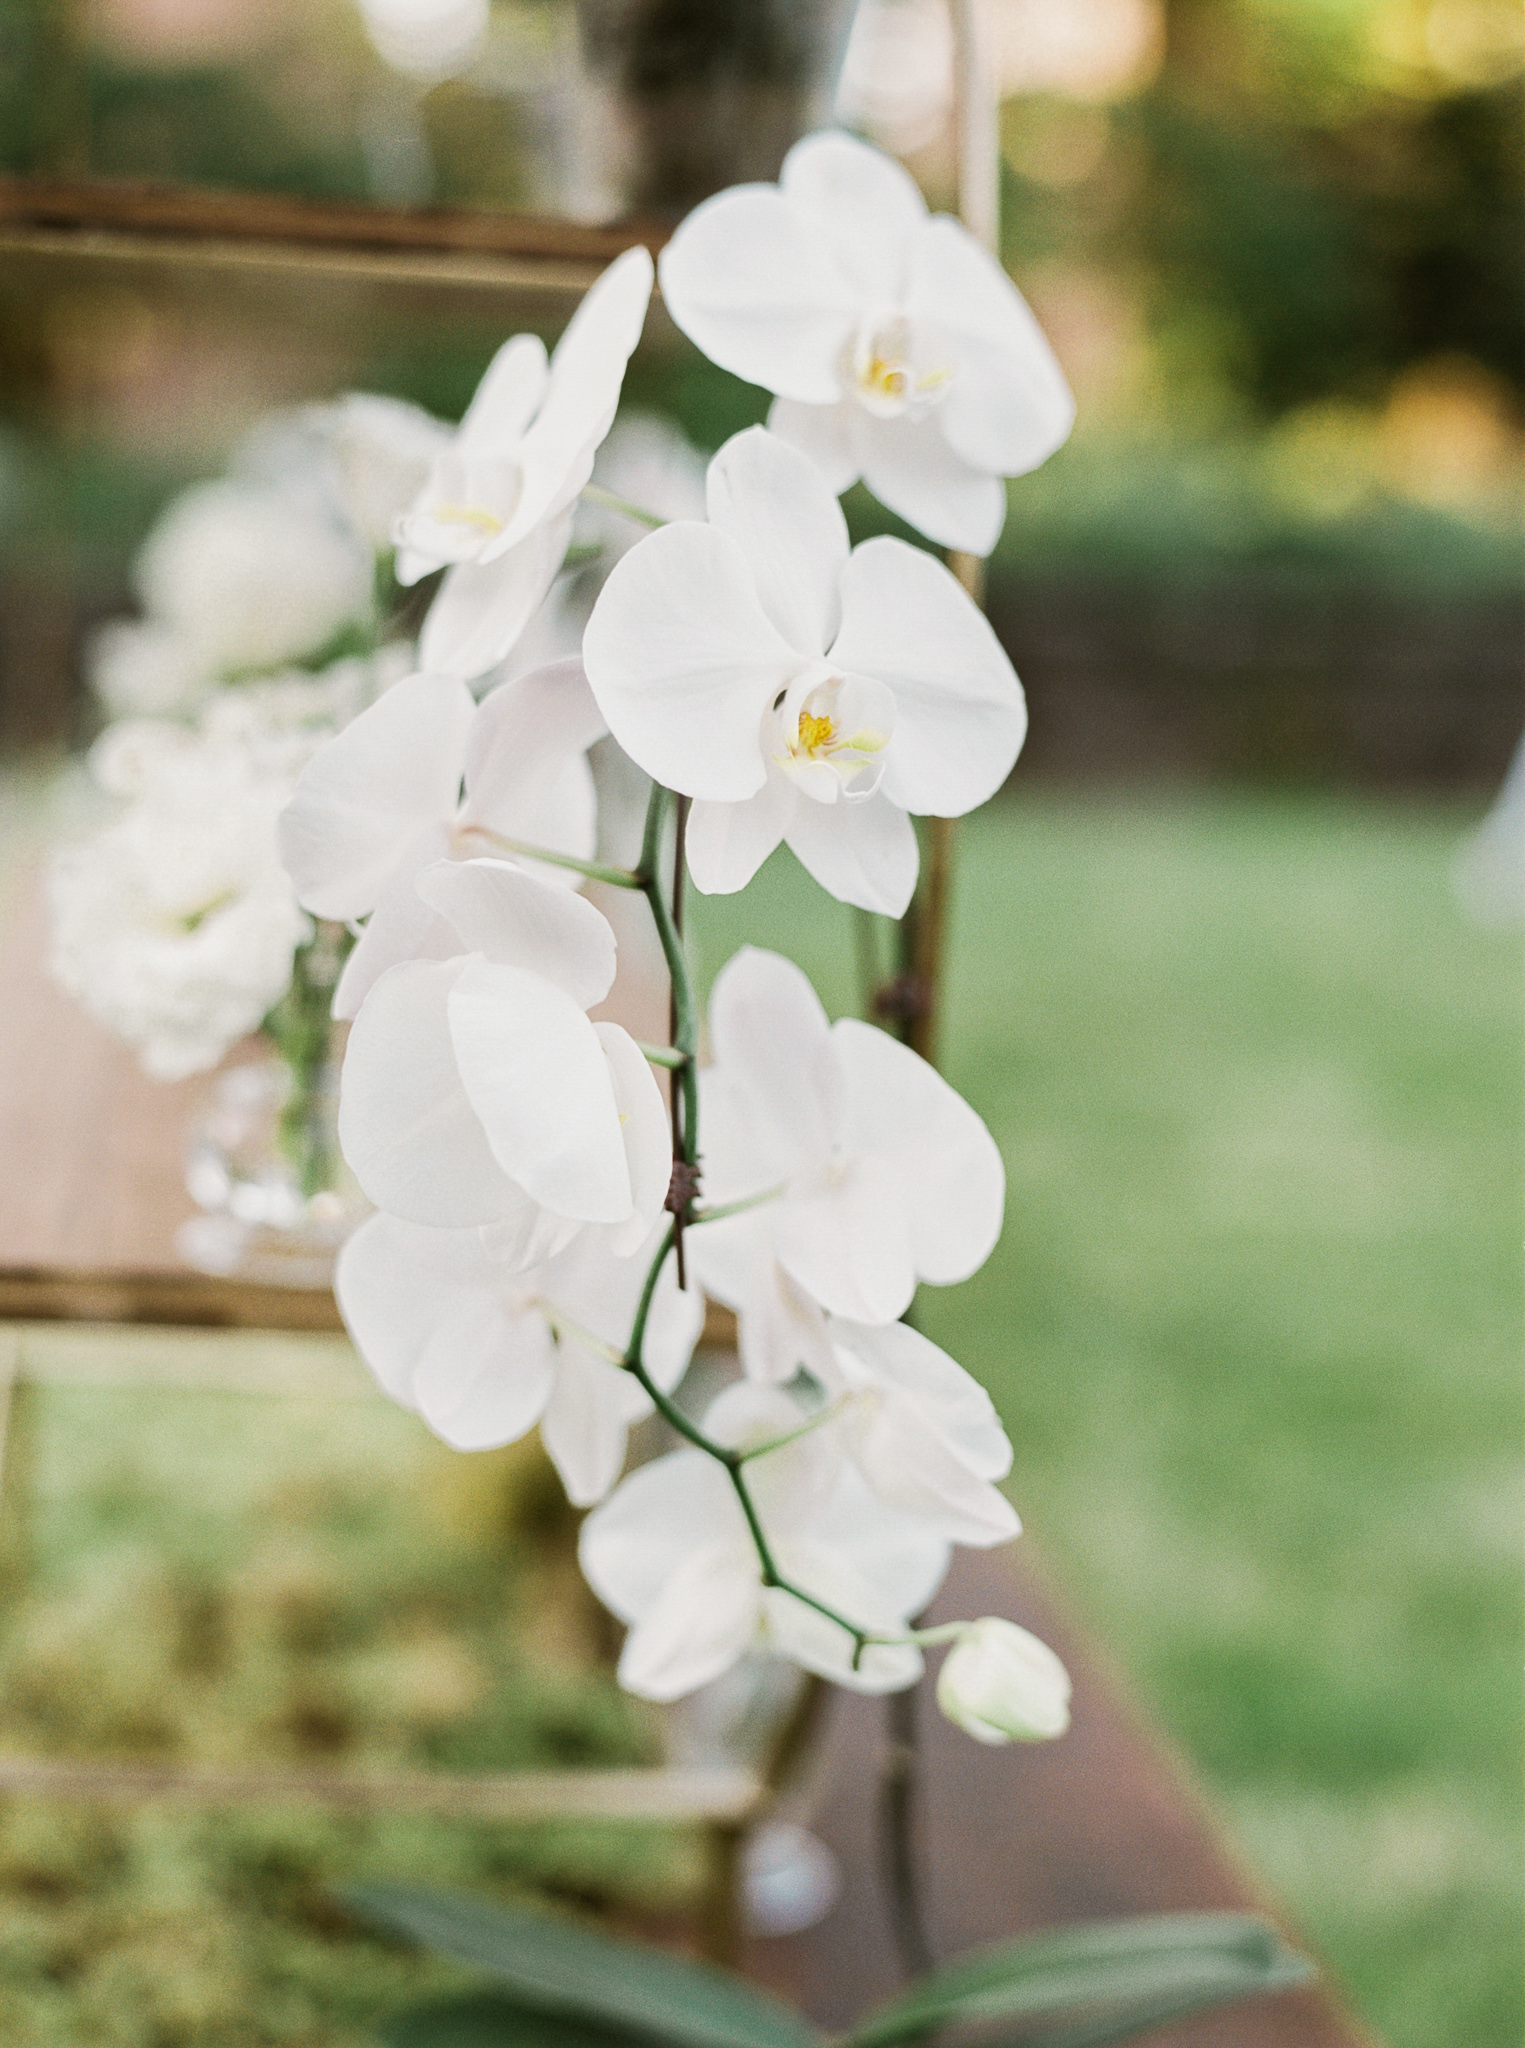 192OutliveCreative_Travel_Photographer_Videographer_Lewis&Clark_Oregon_Elegant_BlackTie_Destination_Wedding.jpg